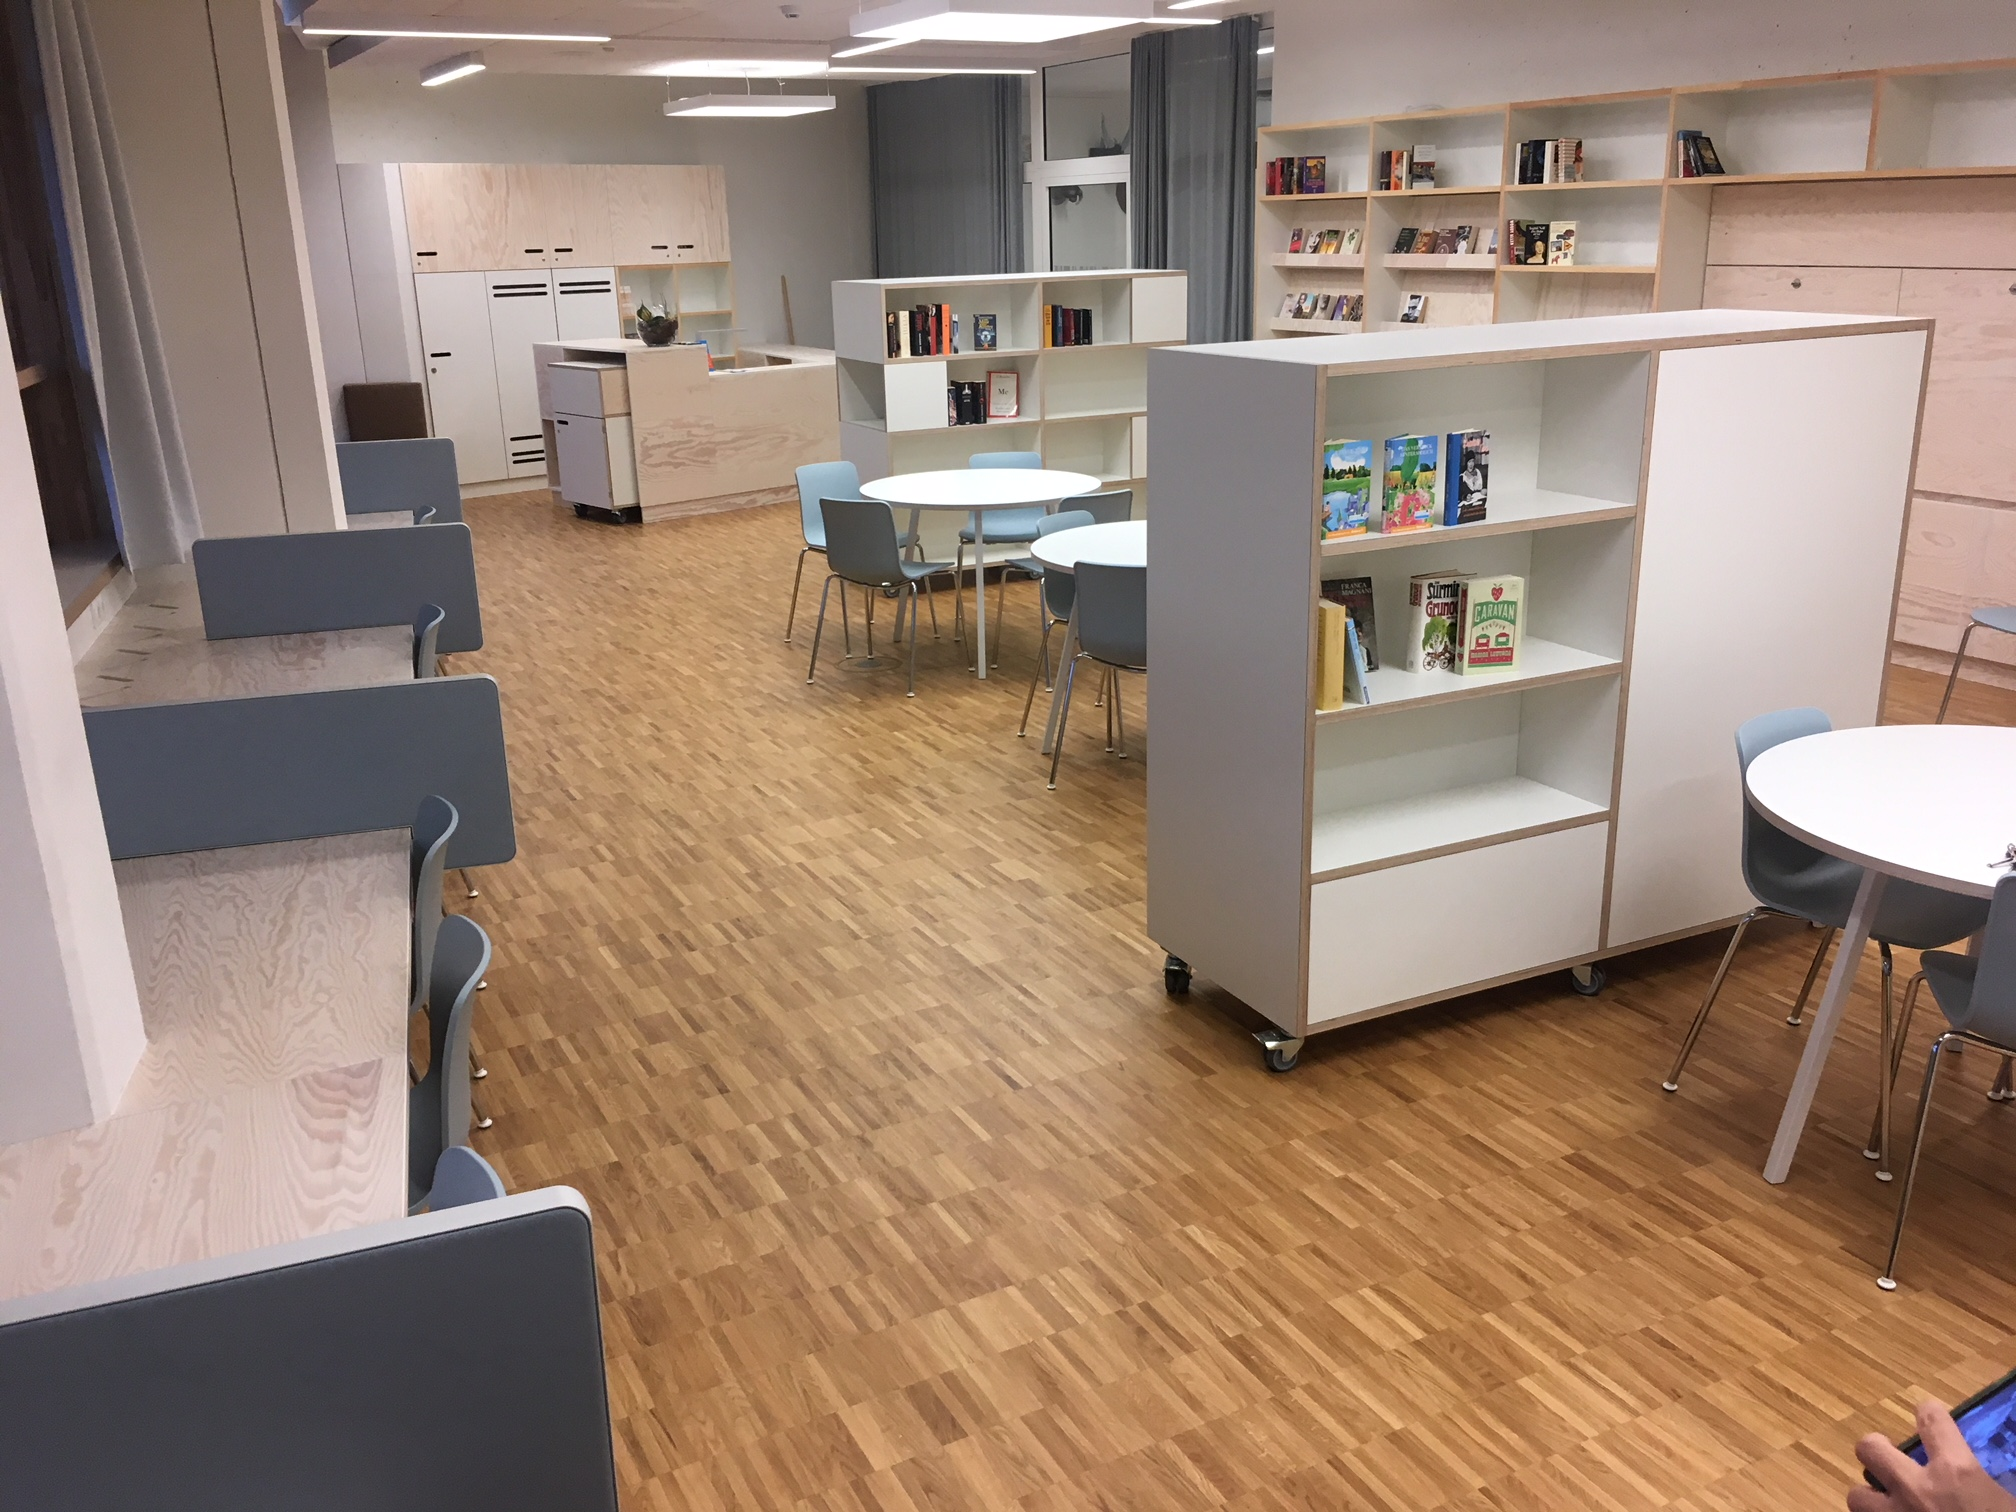 SSB-Bibliothek